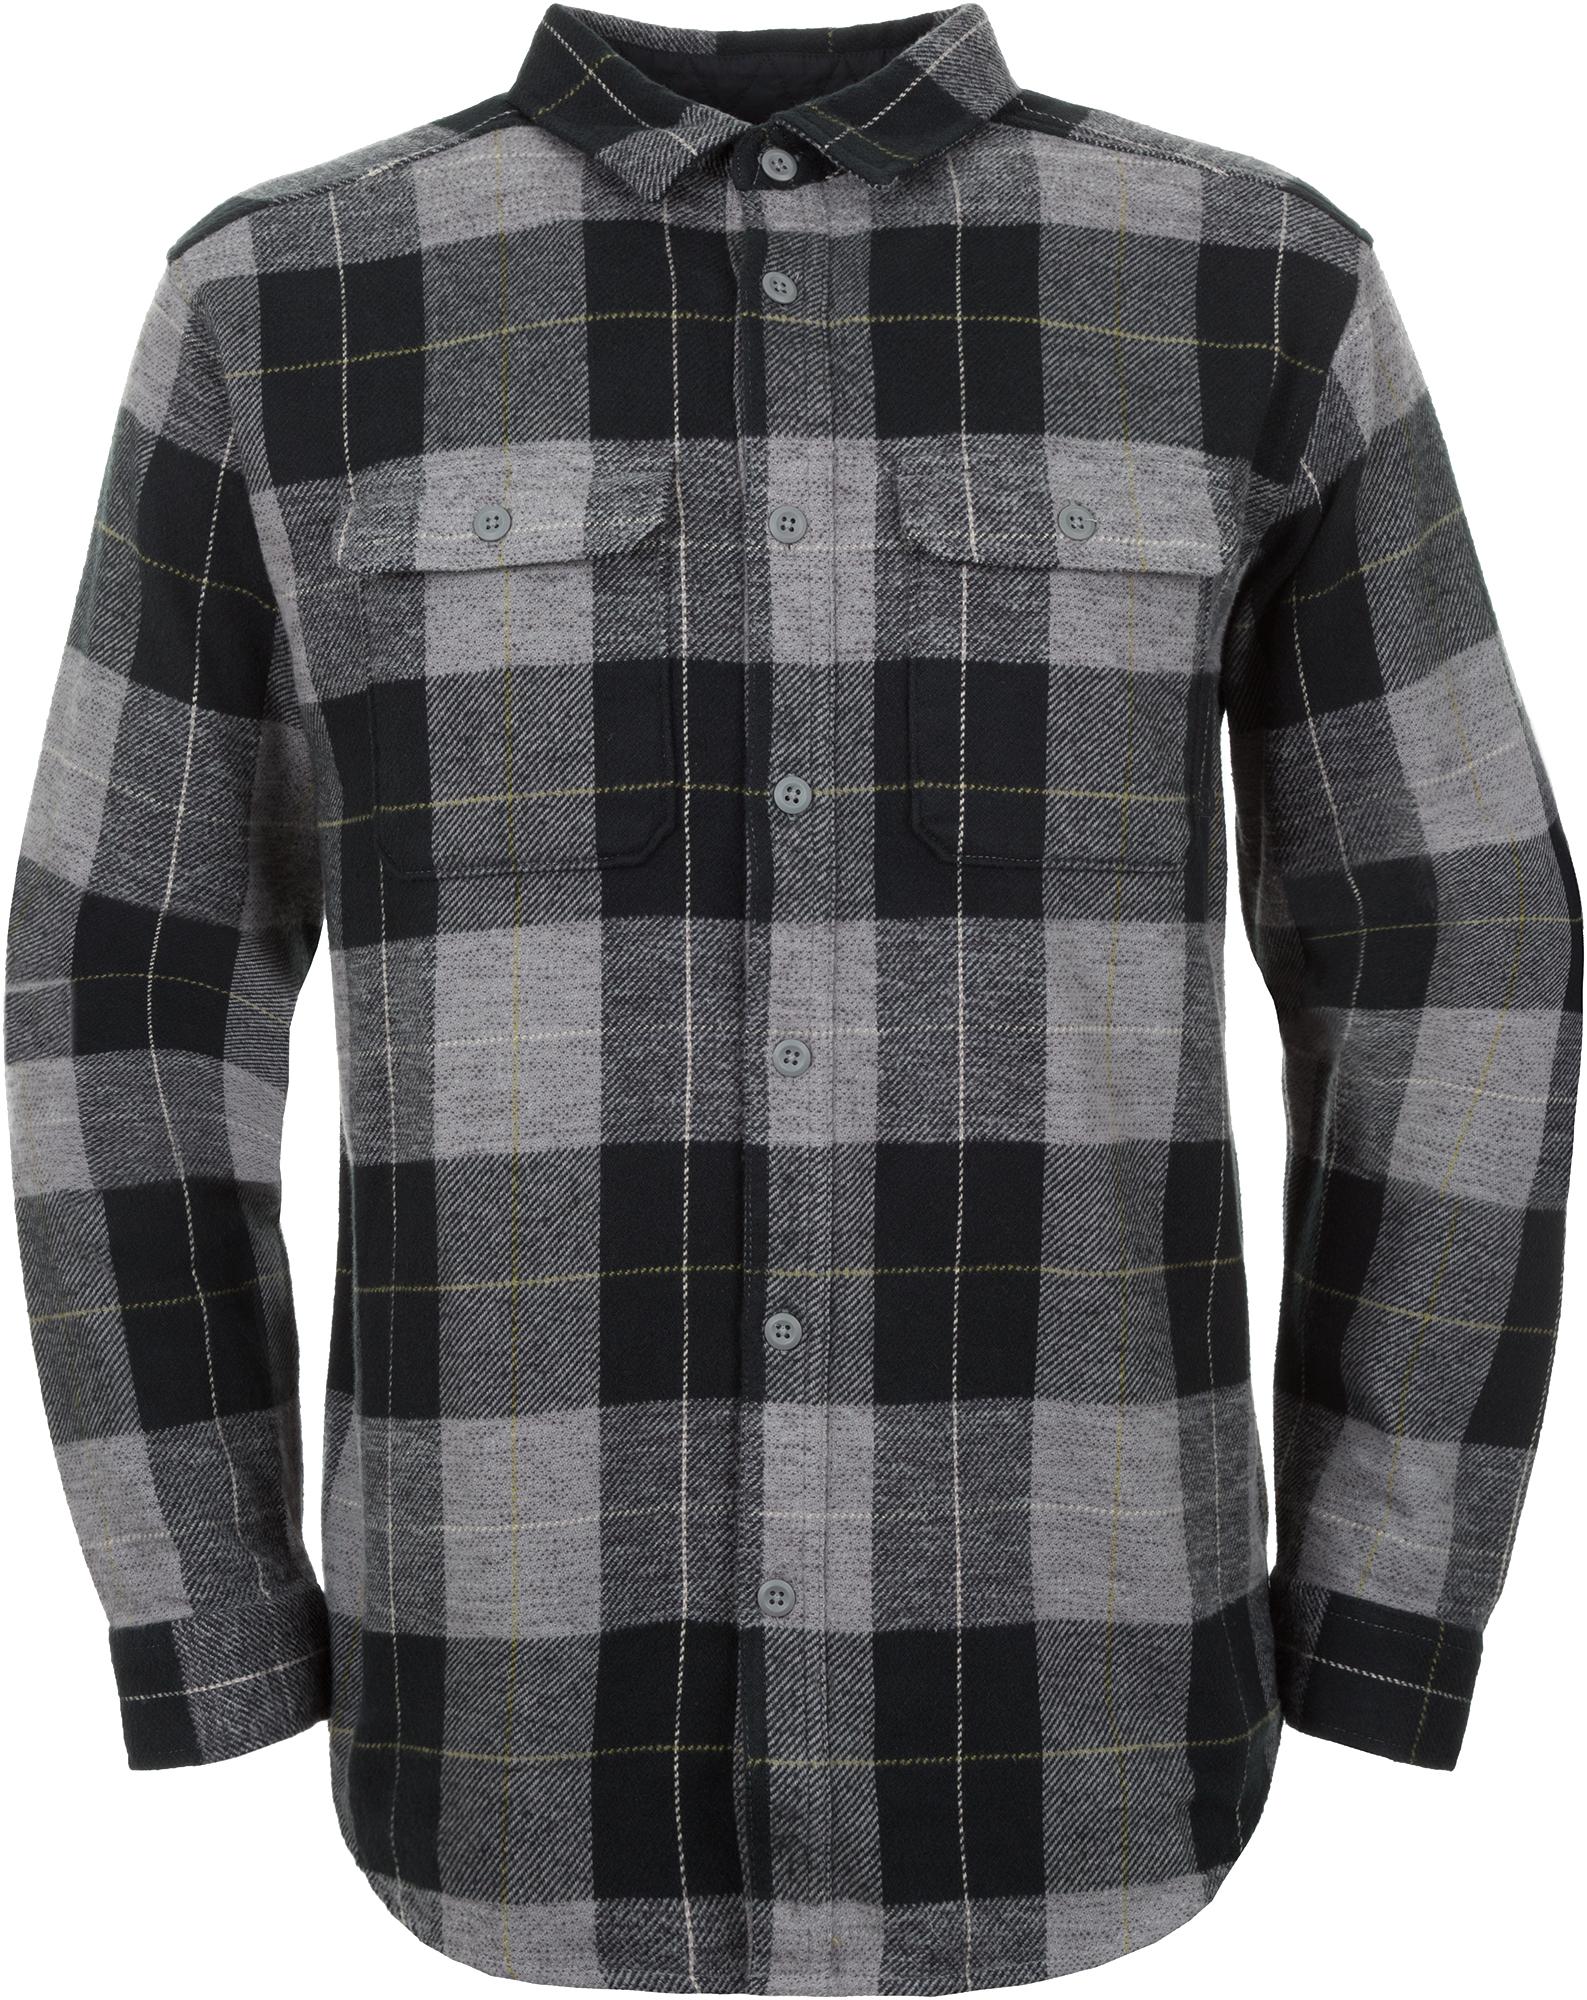 цена на Mountain Hardwear Рубашка с длинным рукавом мужская Mountain Hardwear Walcott, размер 56